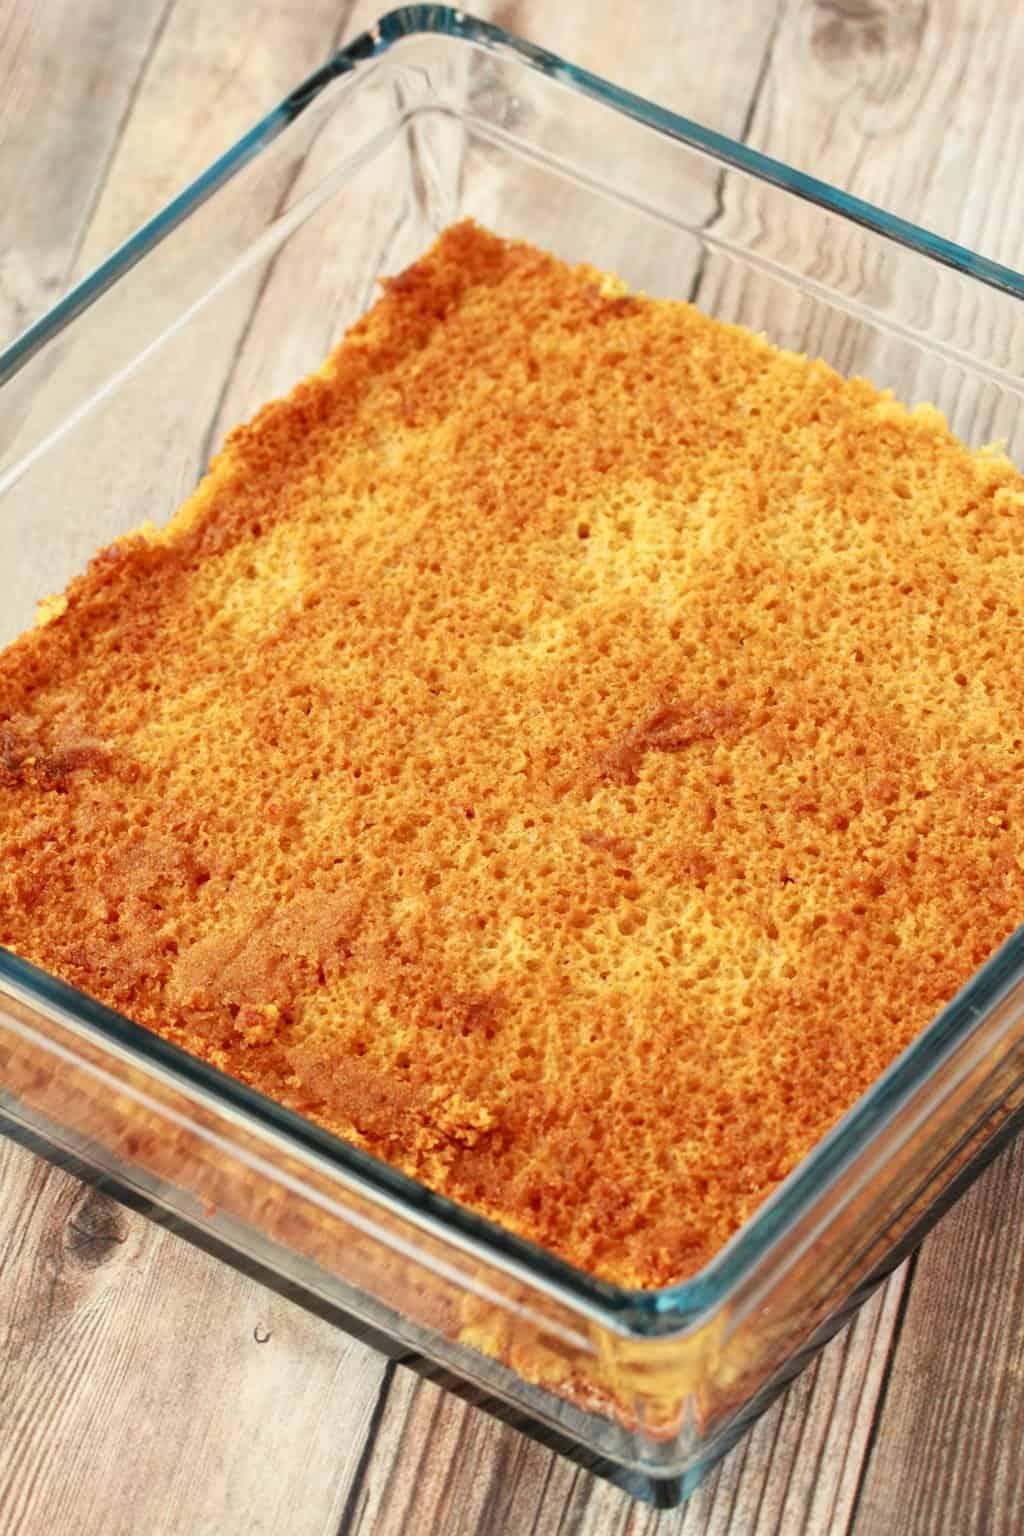 Layer of vanilla sponge cake in a glass dish.